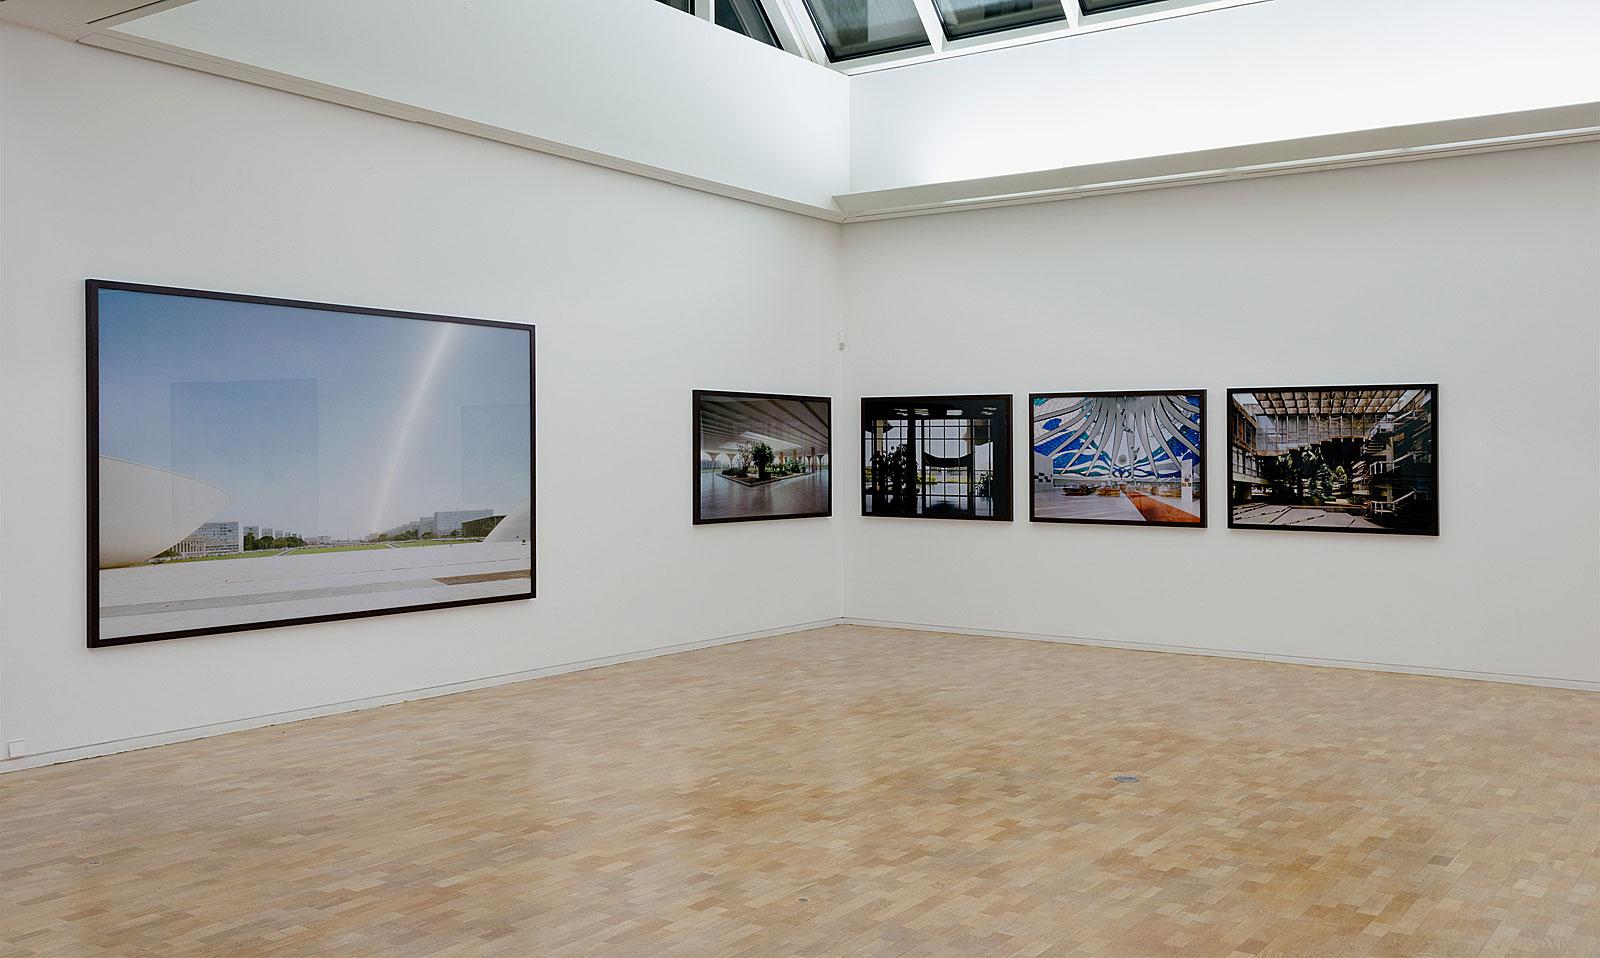 Brasilia, Lina Kim & Michael Wesely, Stadthaus Ulm